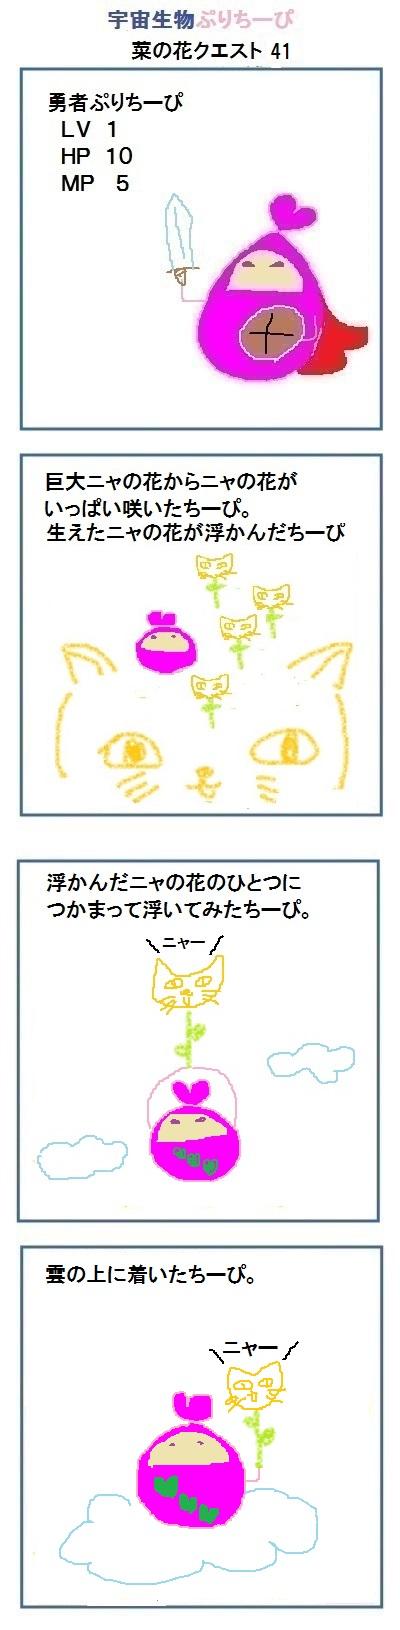 160428_nanohana_quest41.jpg